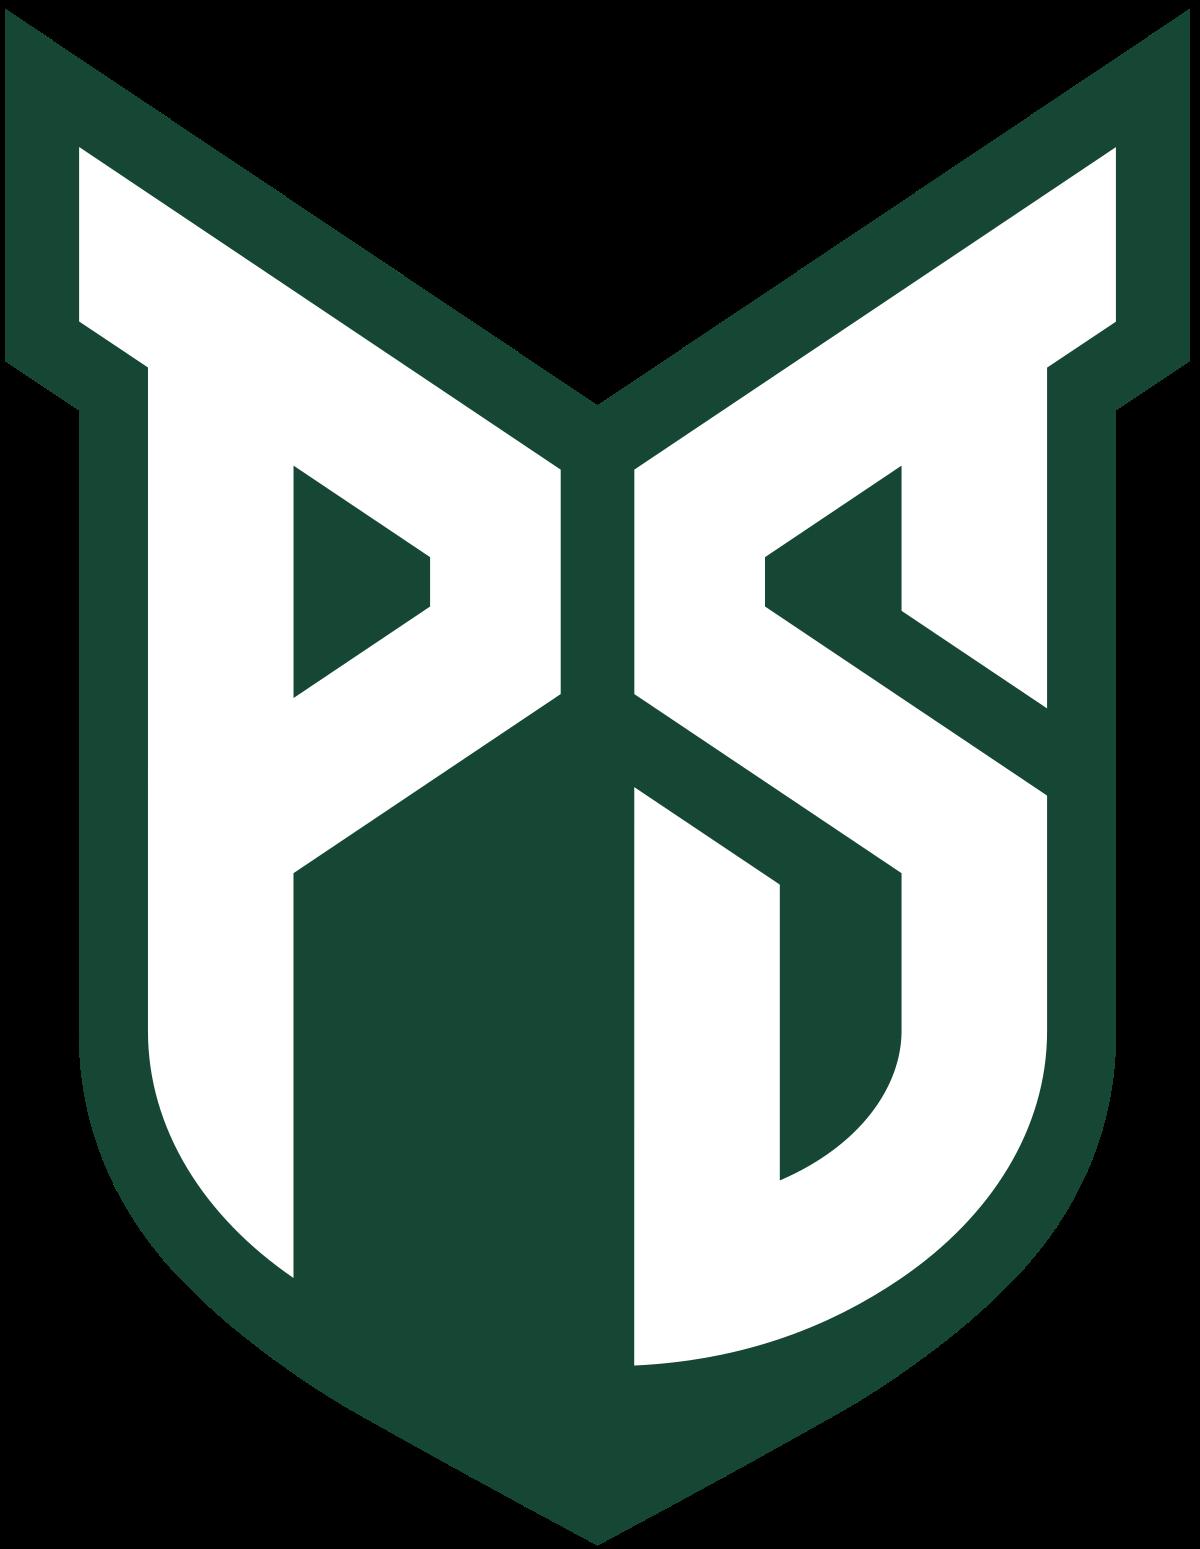 Pin By Patrick V On College Logo S Portland State University Columbus State University Central Michigan University